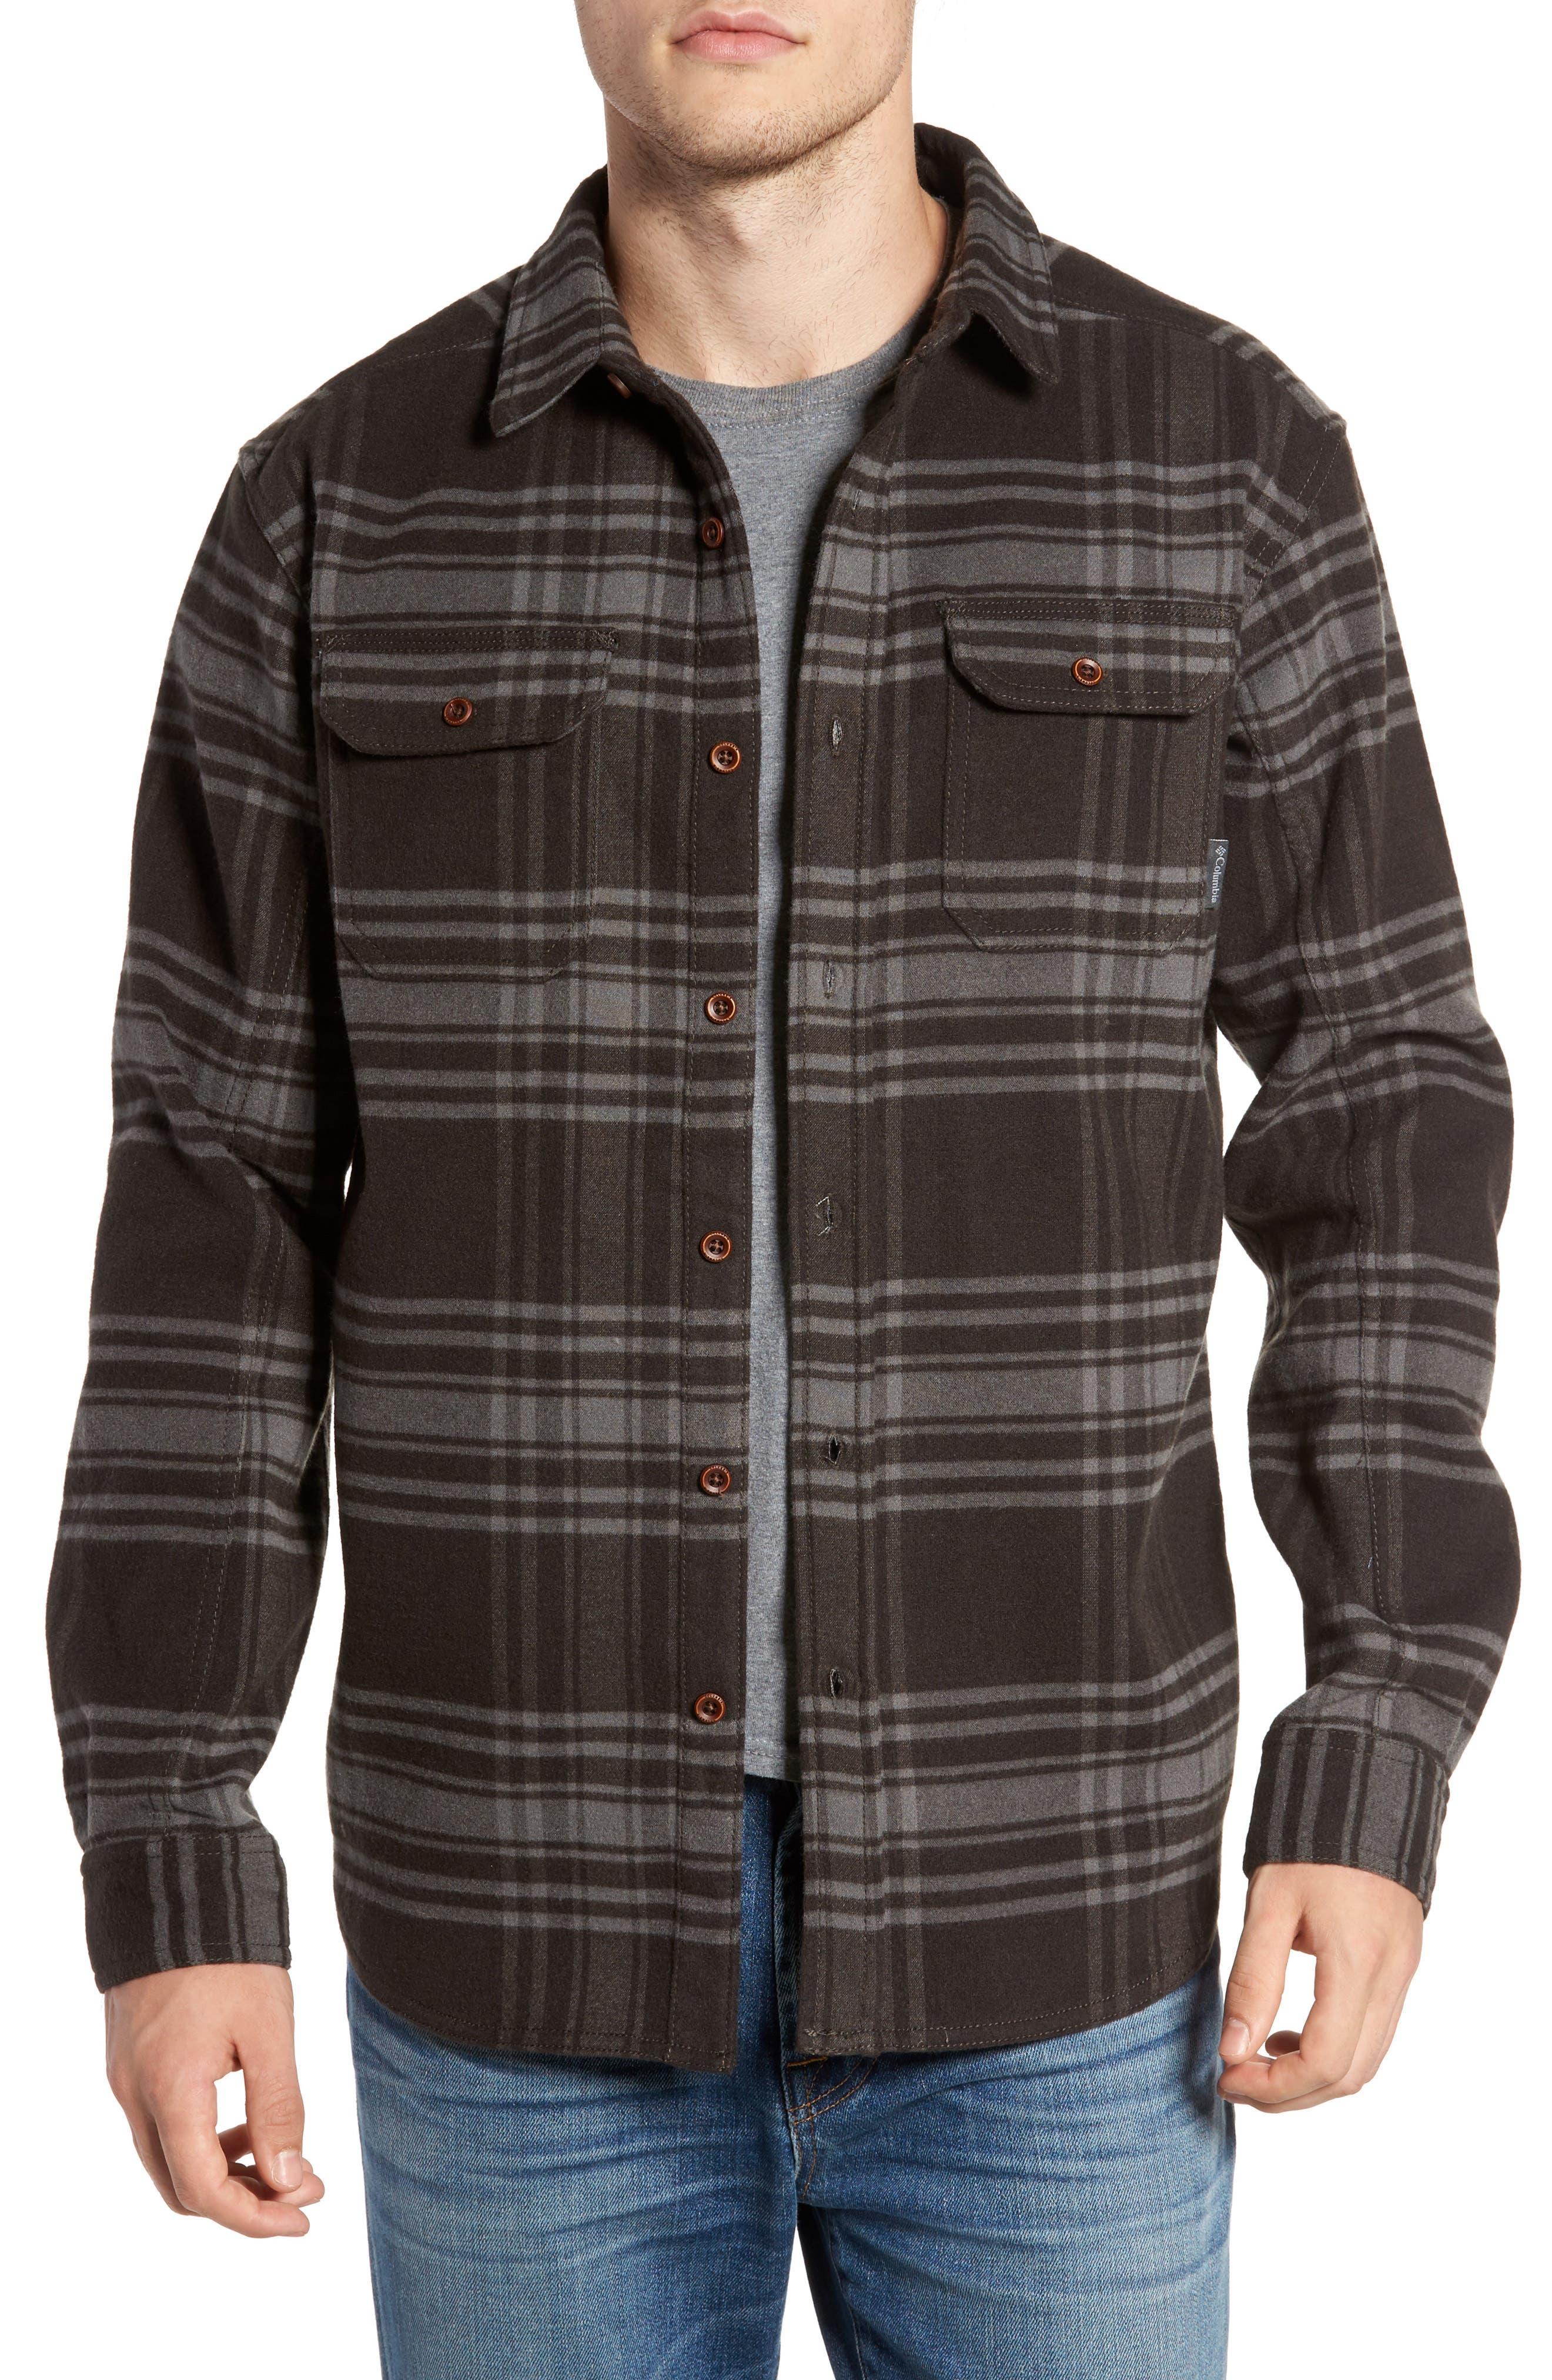 Deschutes River<sup>™</sup> Heavyweight Flannel Shirt Jacket,                             Main thumbnail 1, color,                             200